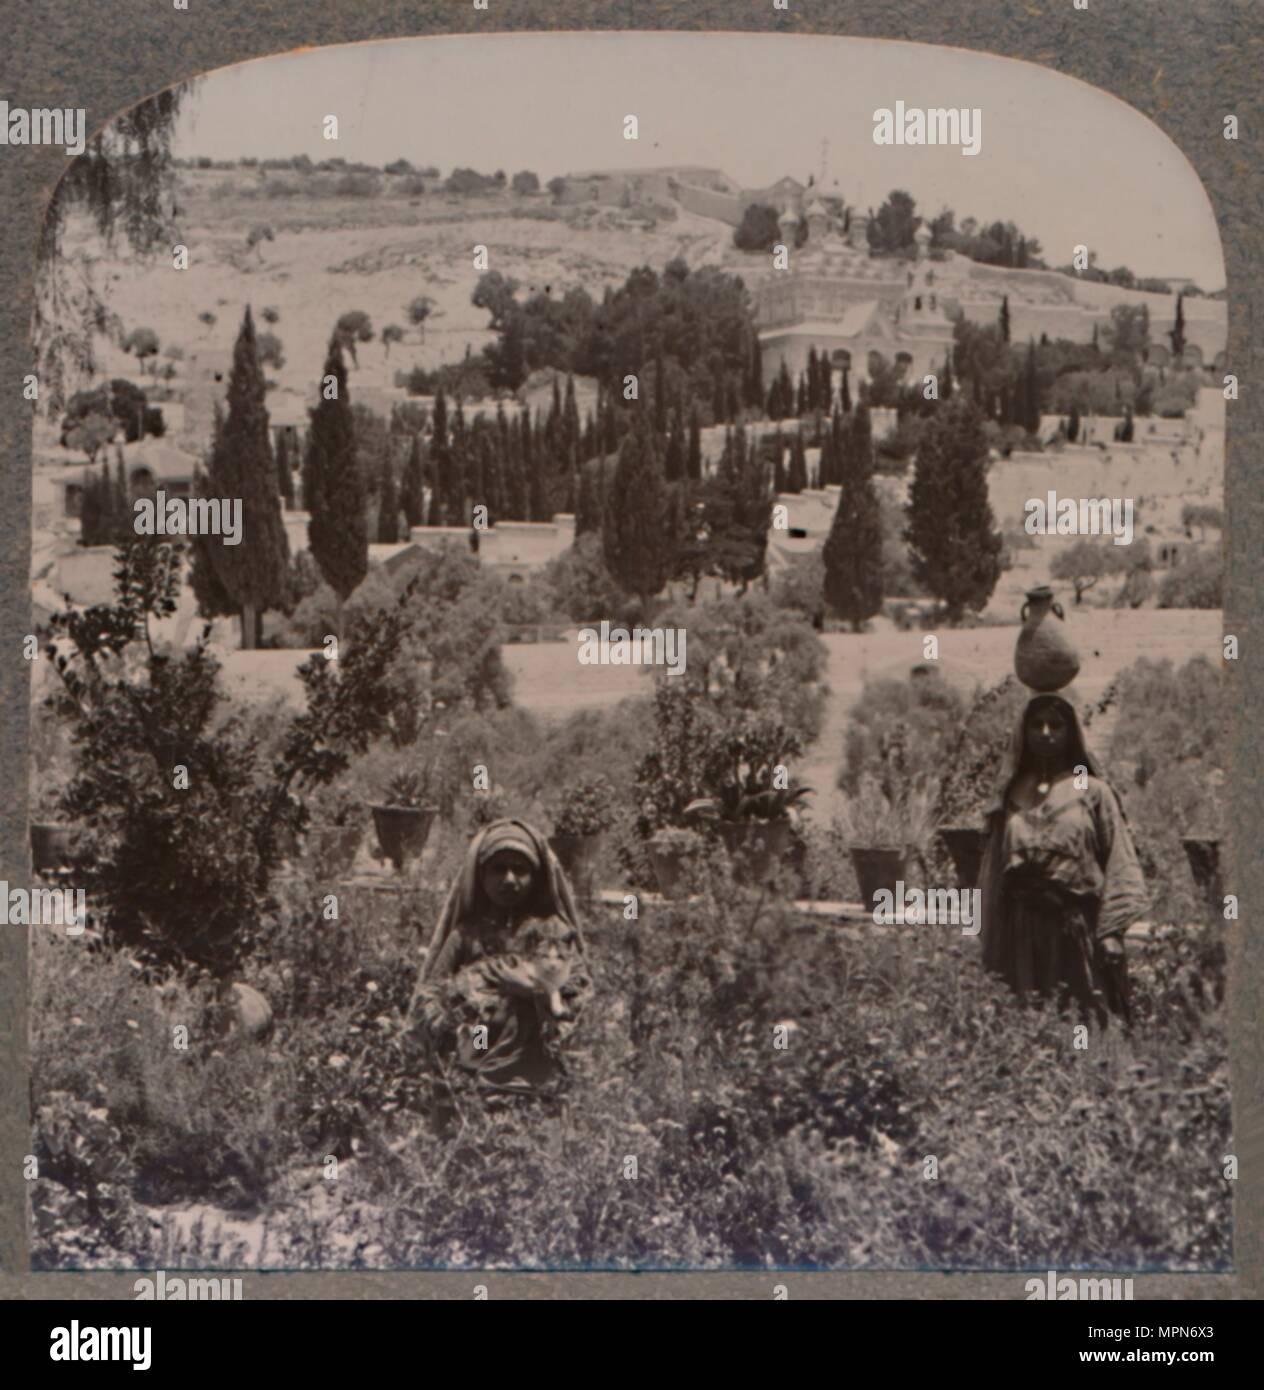 Garden Of Gethsemane Photos Garden Of Gethsemane Images Alamy